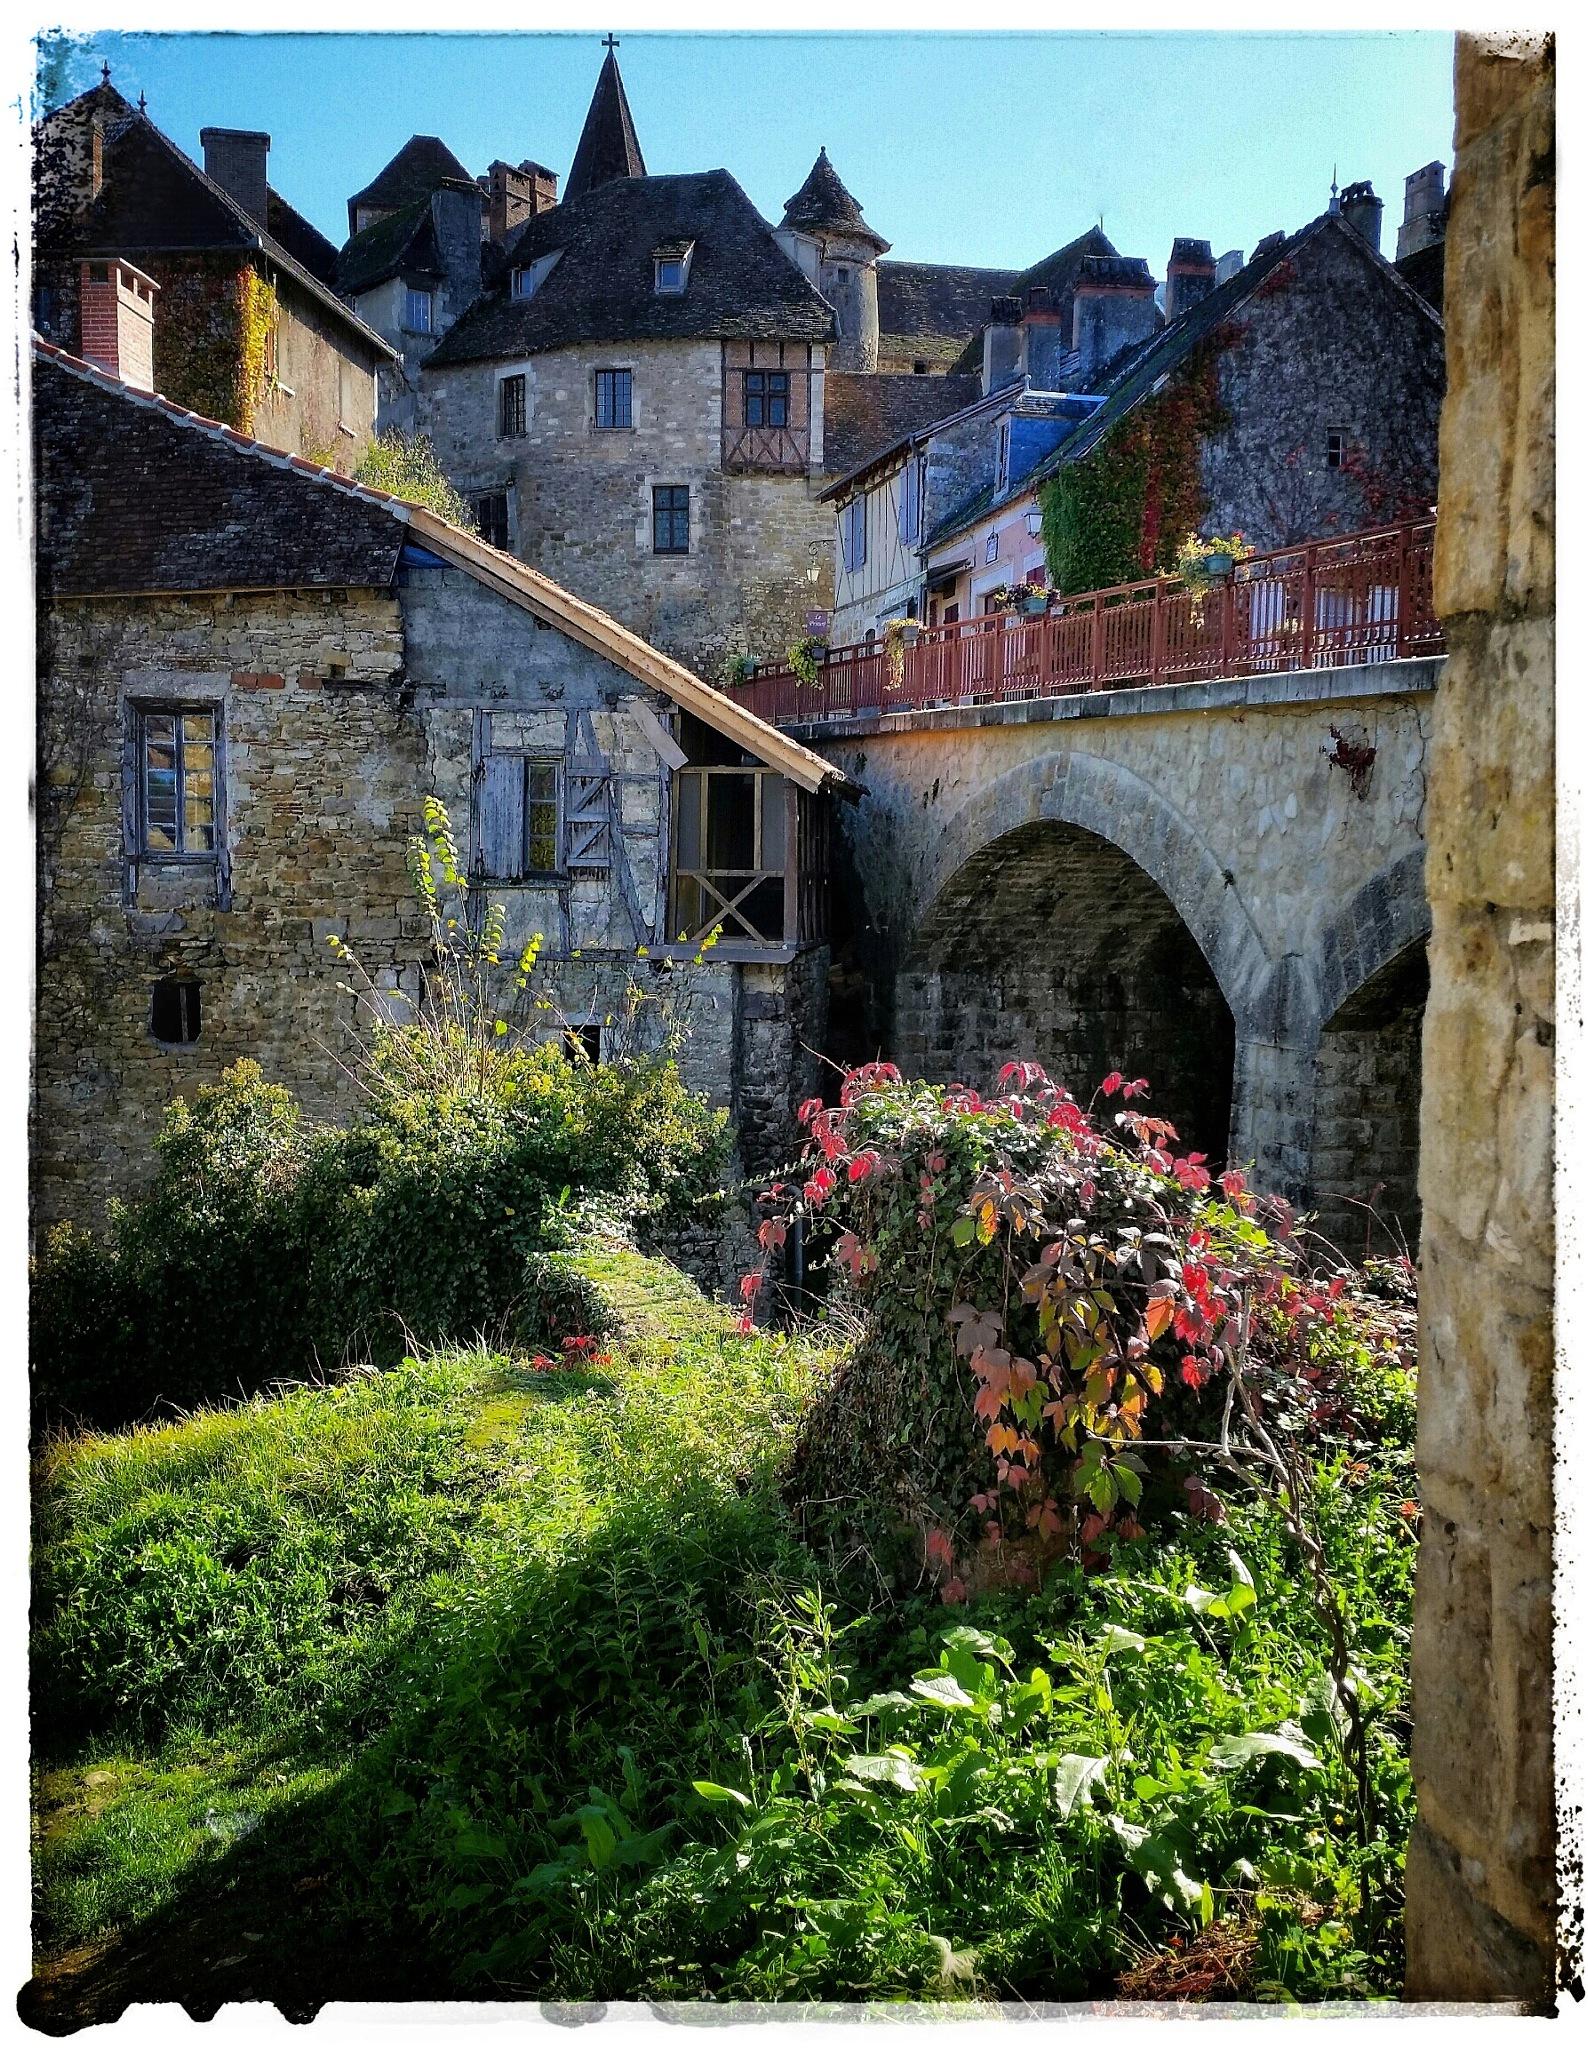 The Village of Carennac by Claudia Farolfi